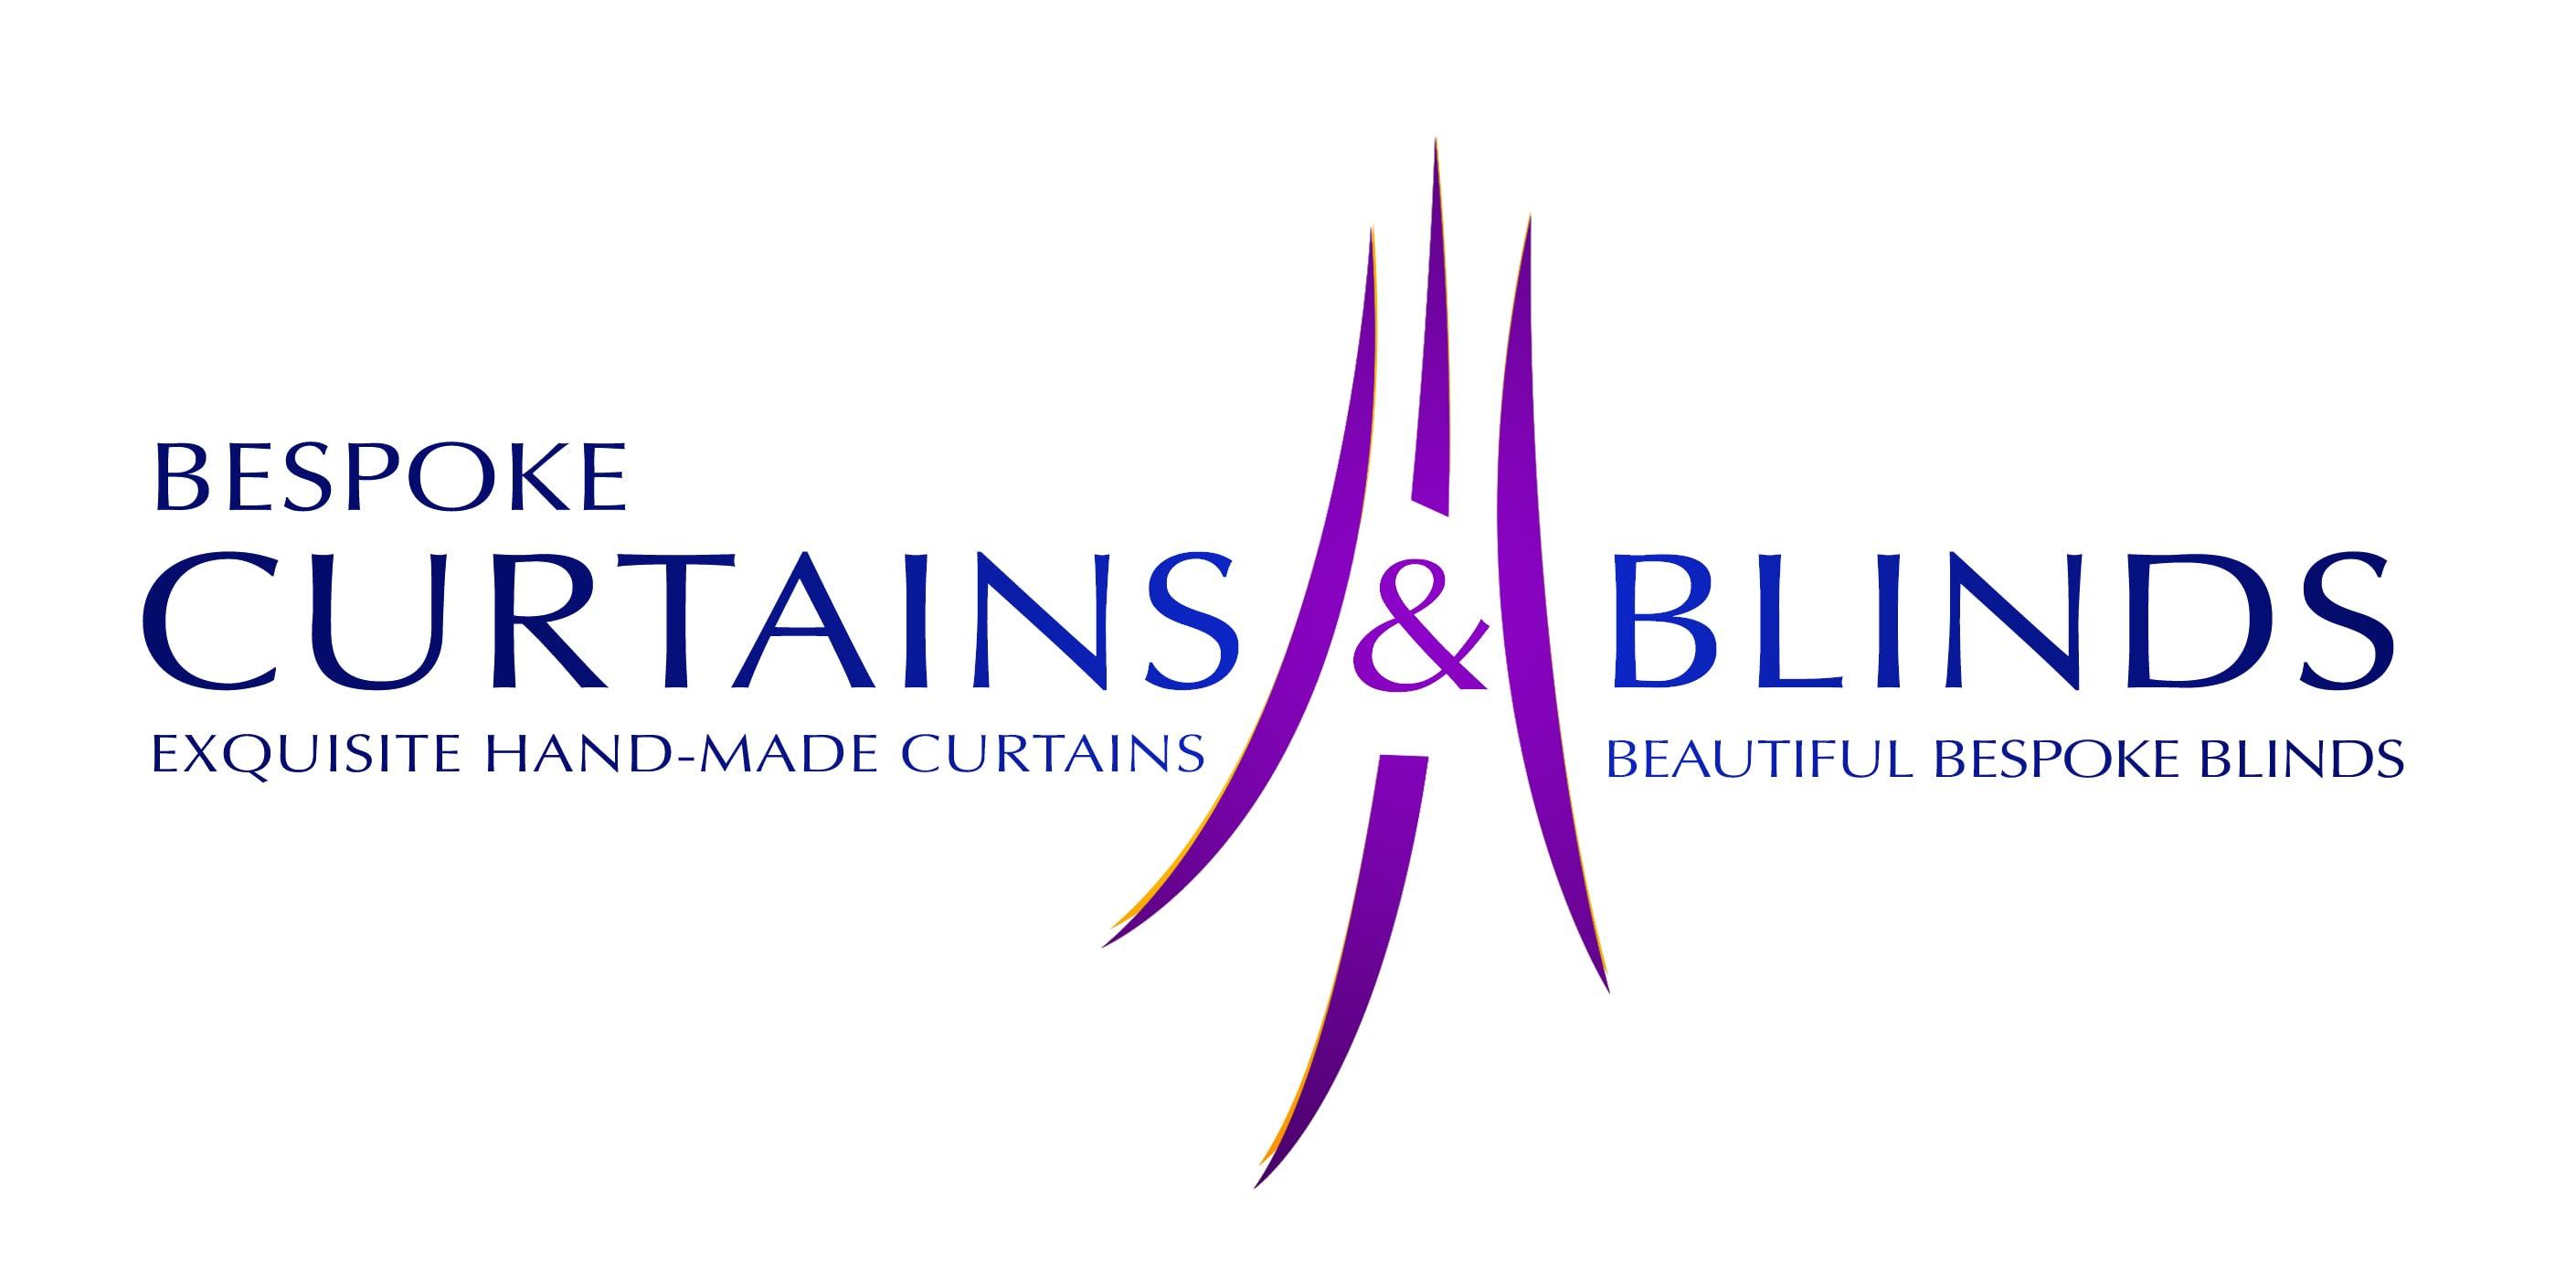 Bespoke Curtains & Blinds